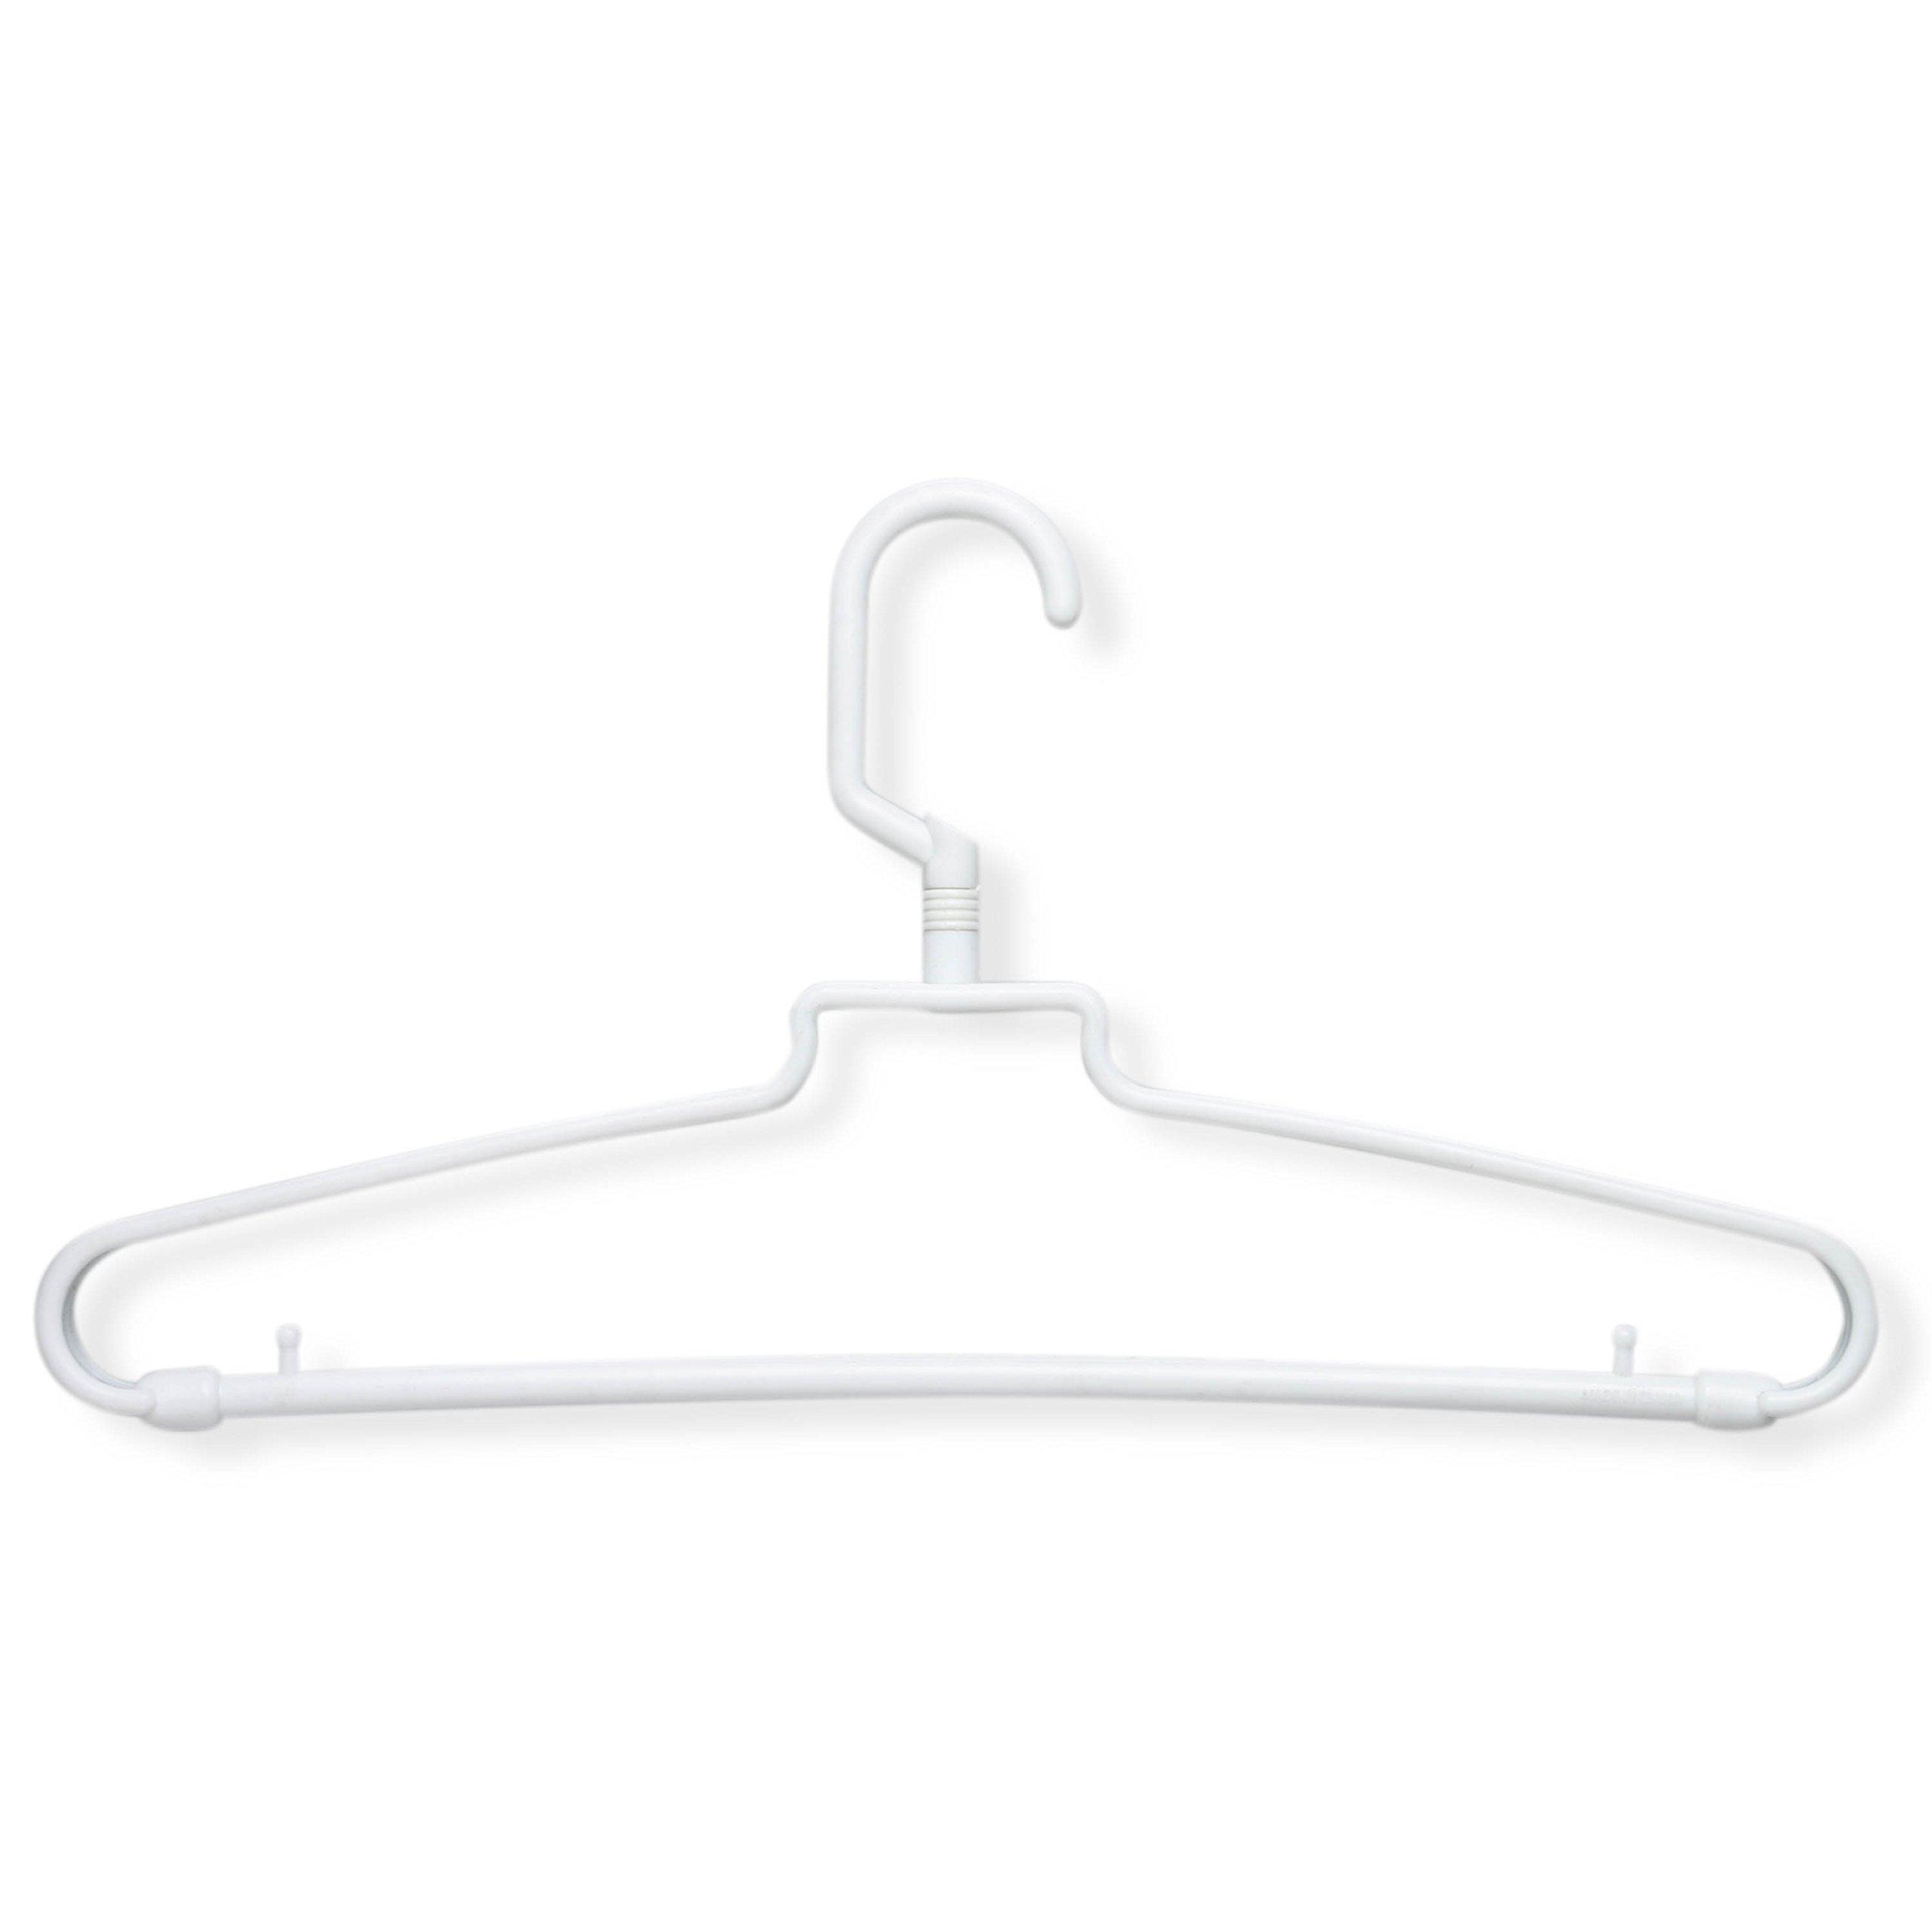 Honey-Can-Do HNG-01358 Hotel Style Hanger, 72-Pack, White